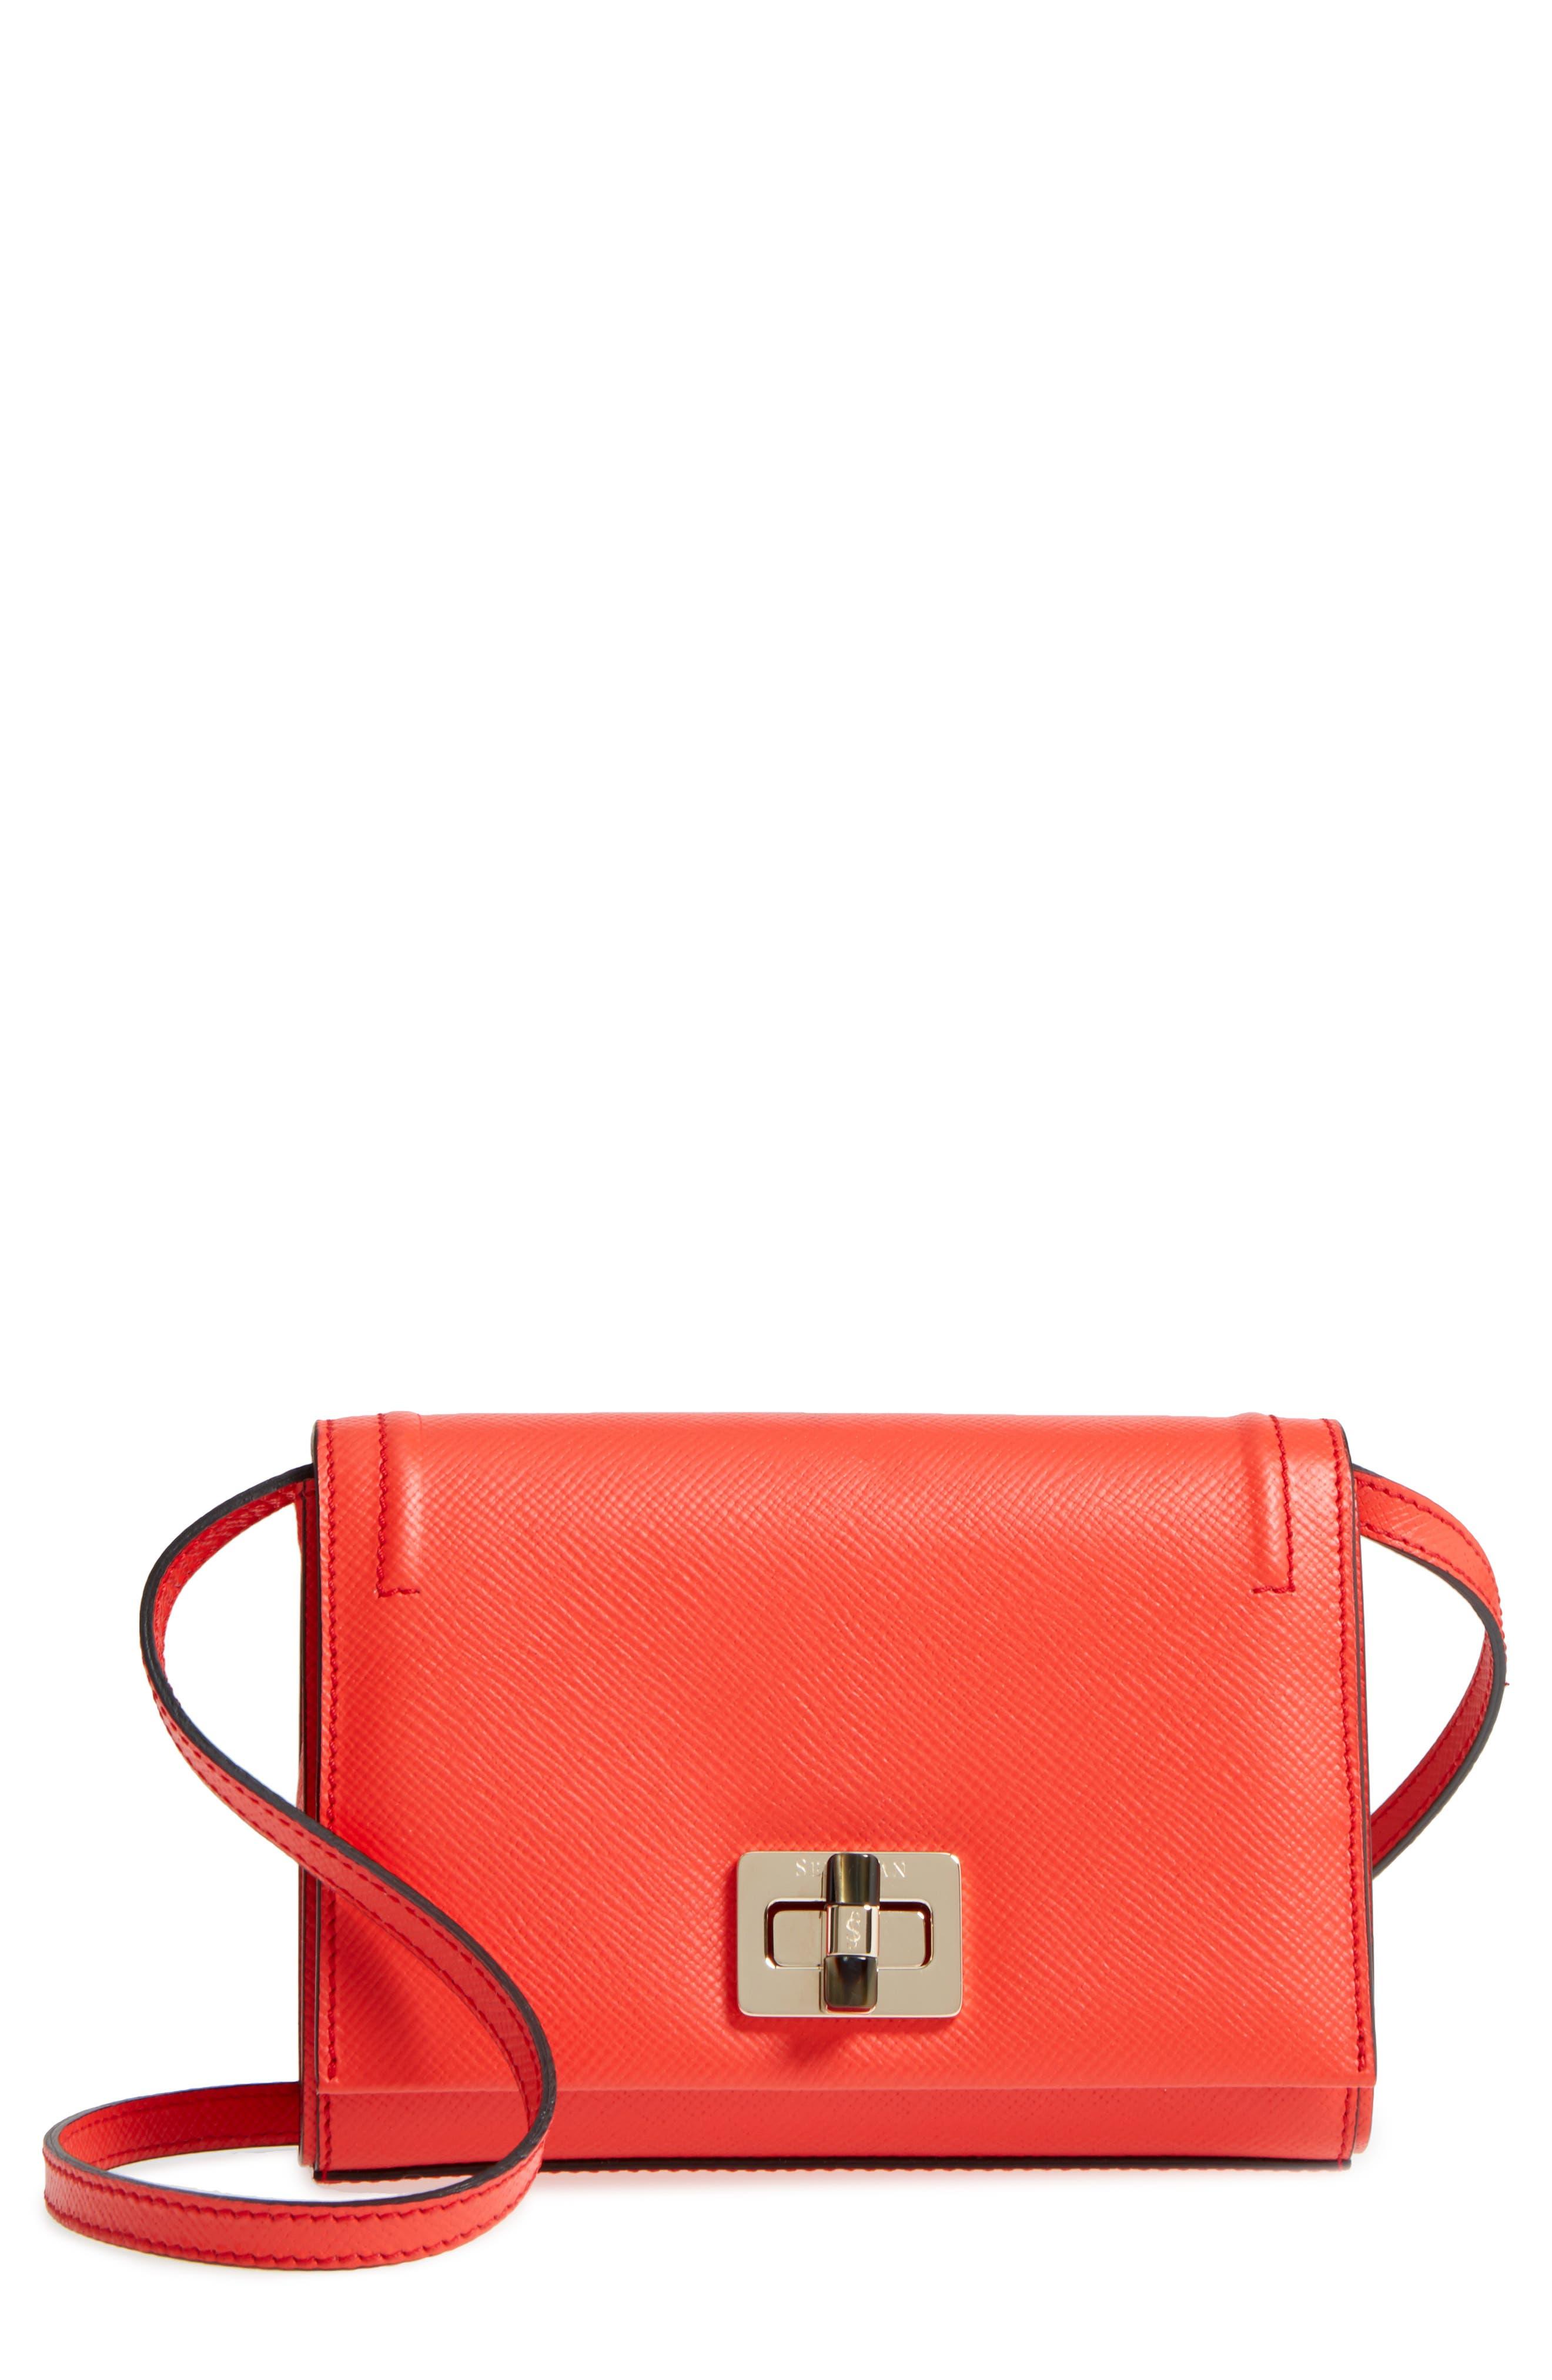 Mini Ilenea Leather Crossbody Bag,                         Main,                         color, Coral Red